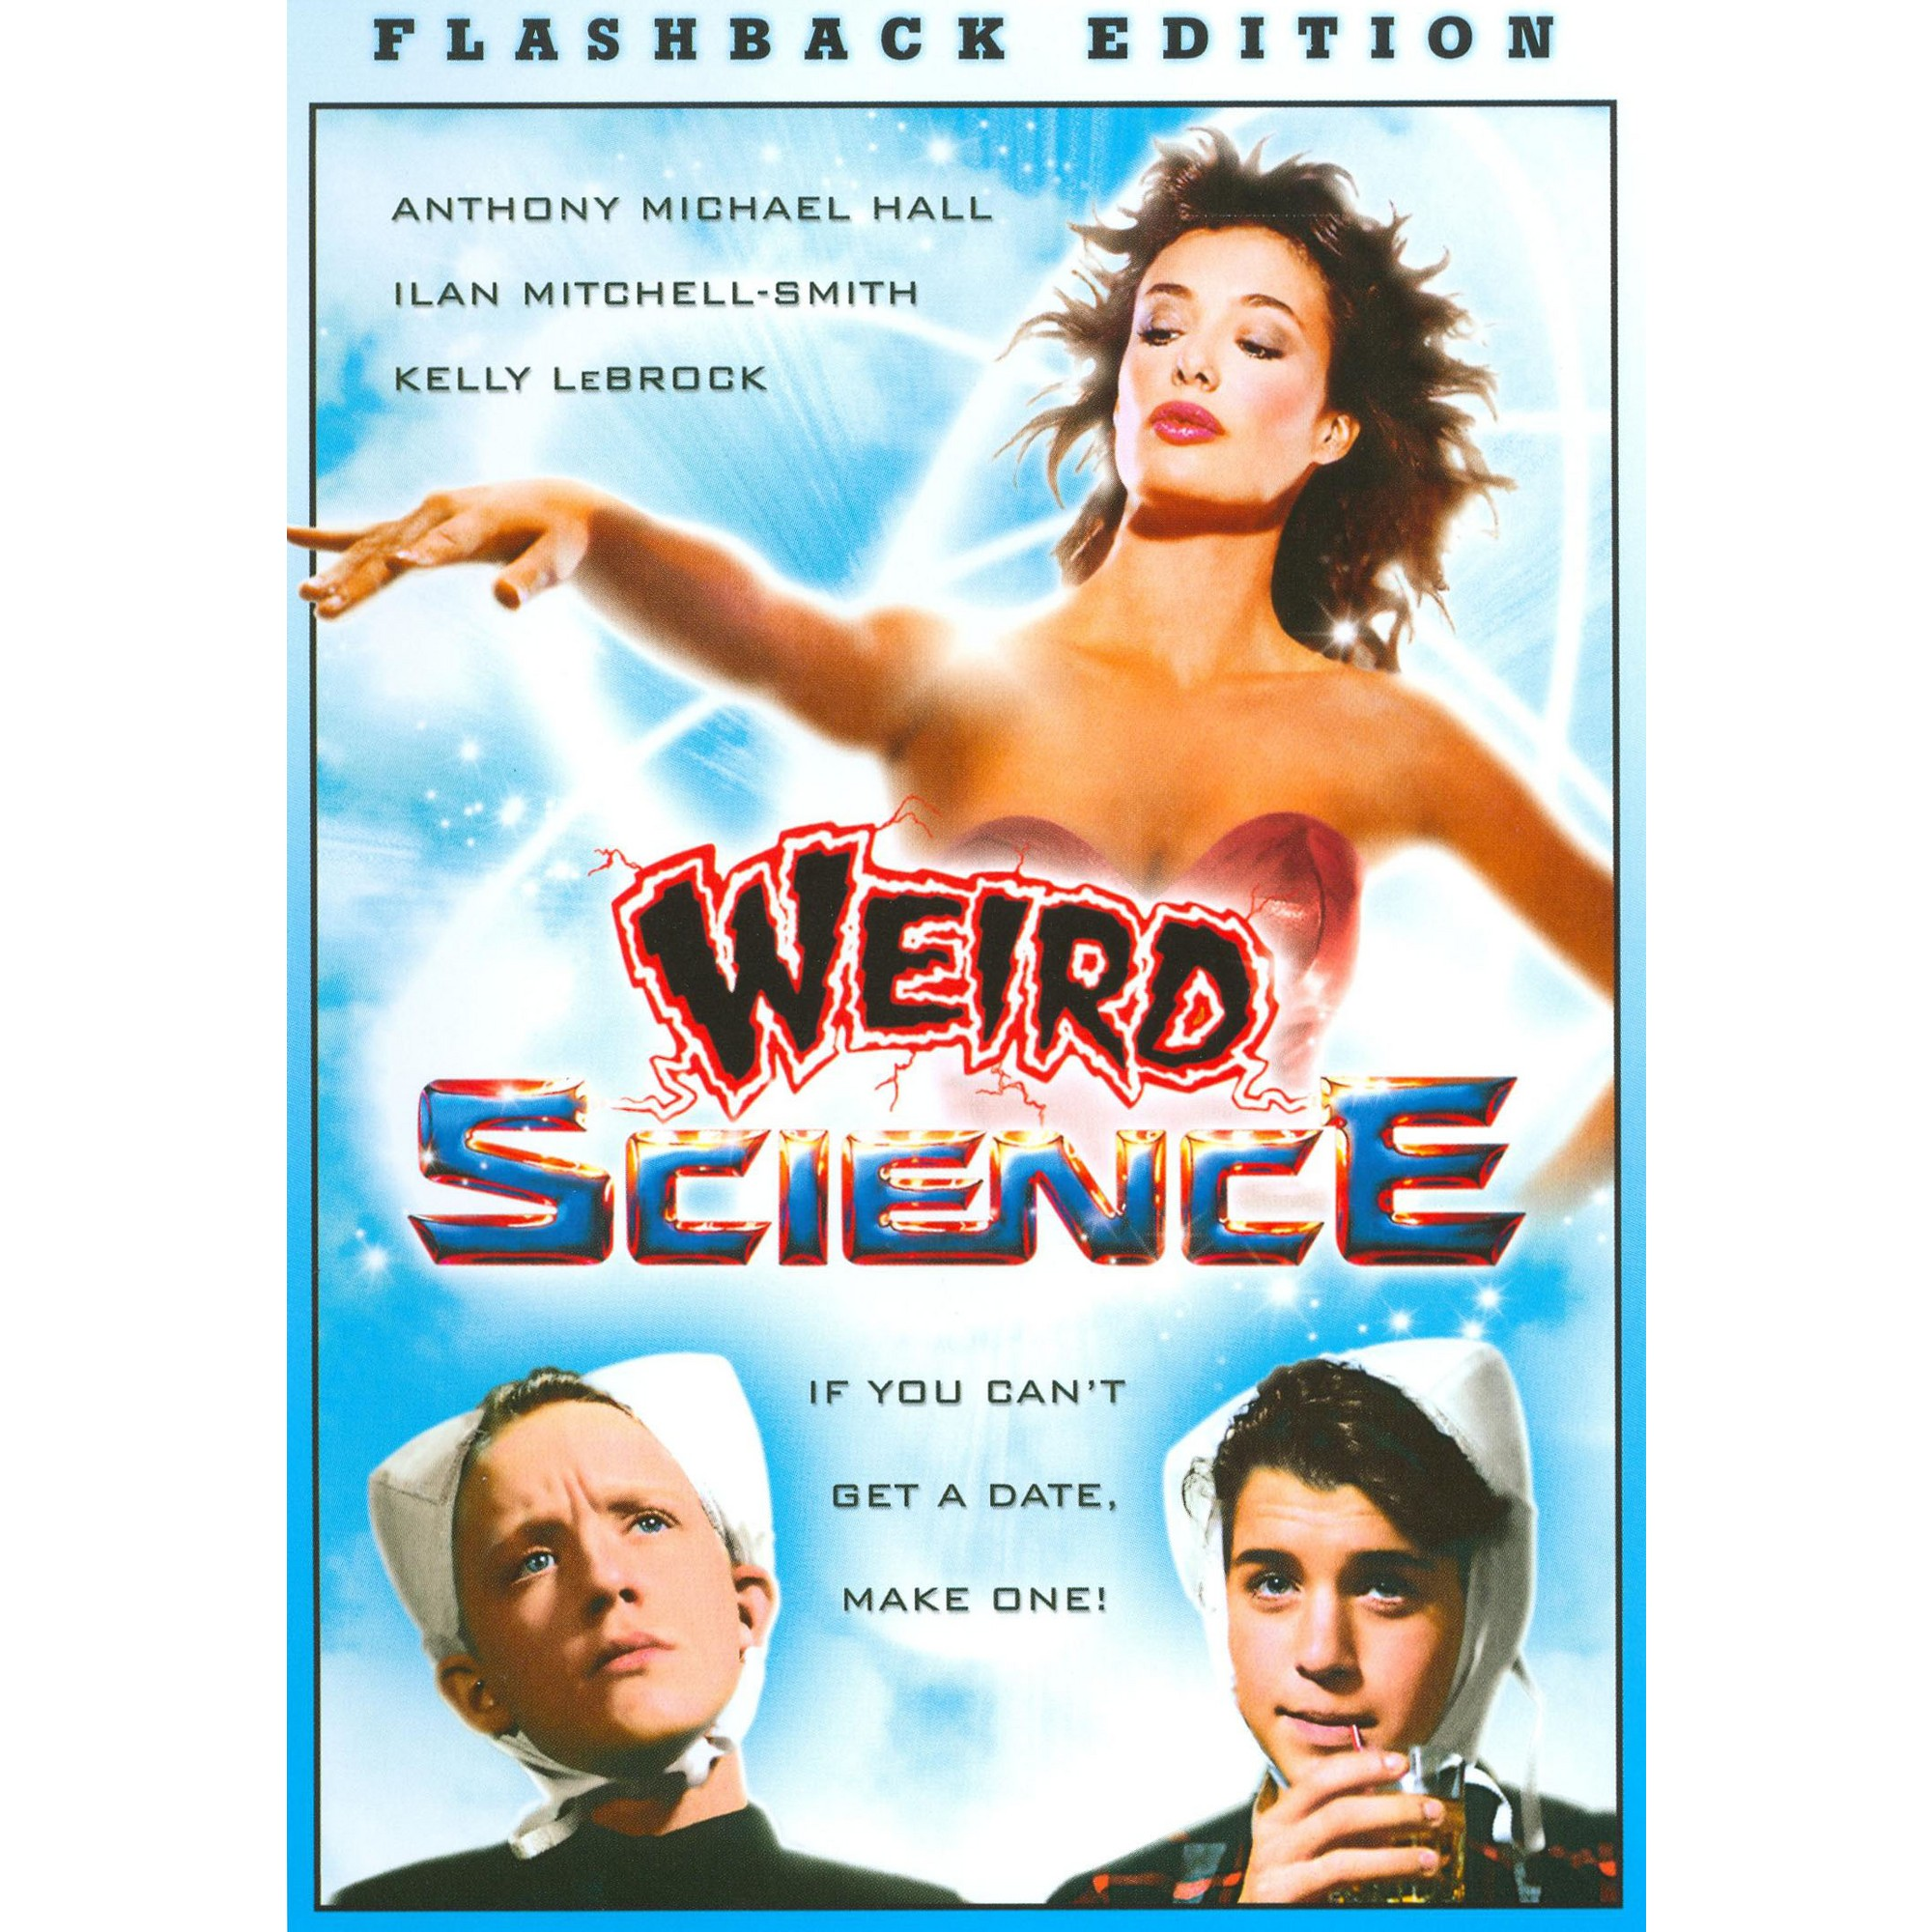 Weird Science [Flashback Edition] Weird science, Kelly